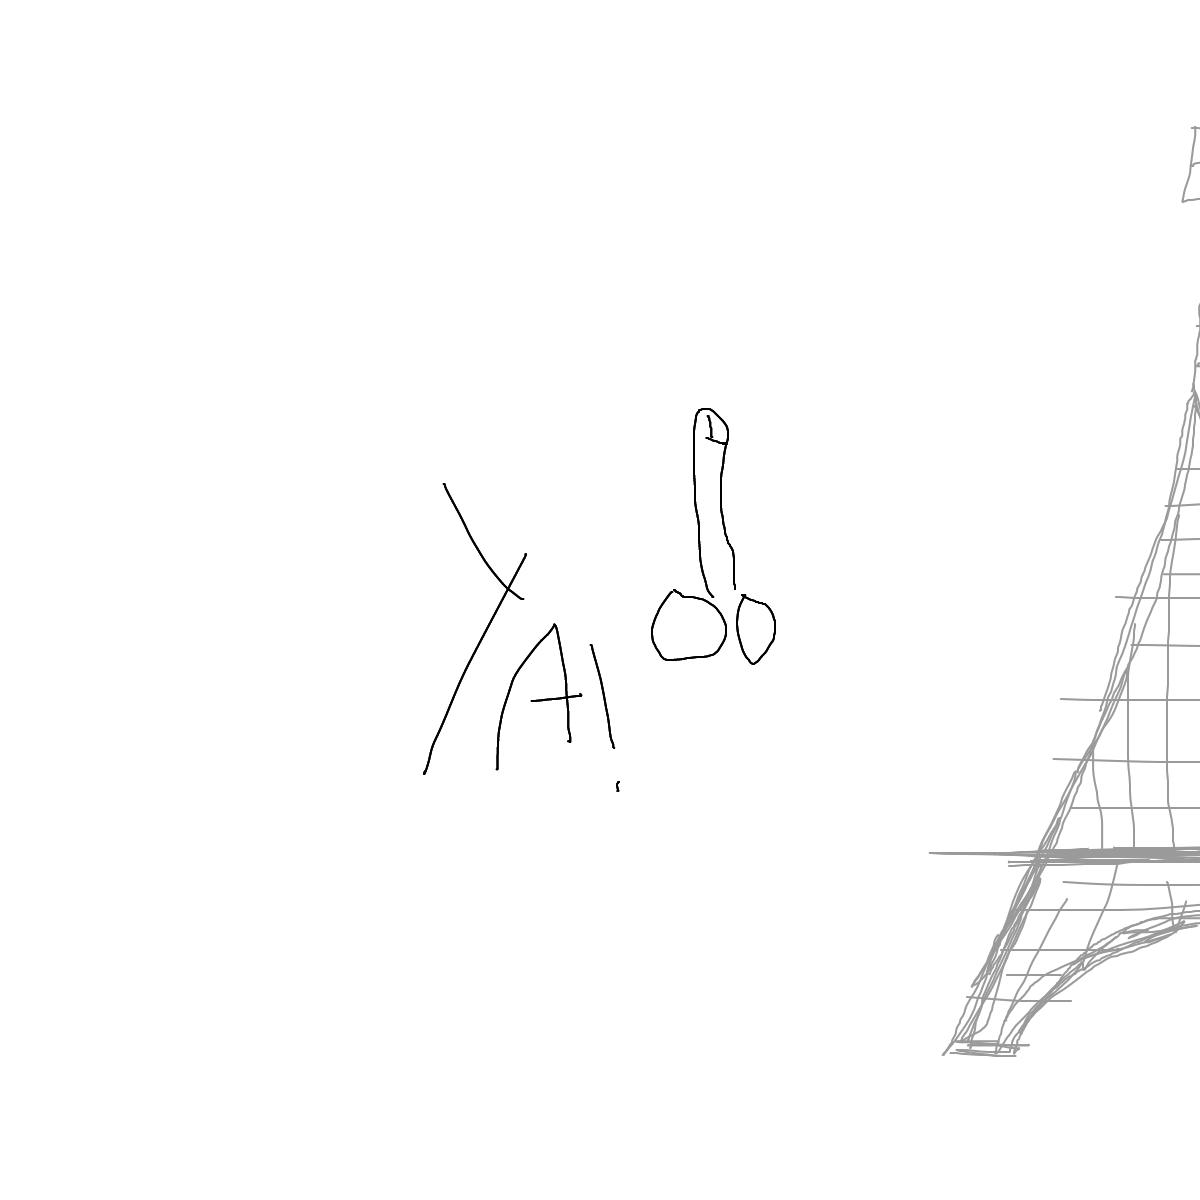 BAAAM drawing#1716 lat:48.8586349487304700lng: 2.2941639423370360